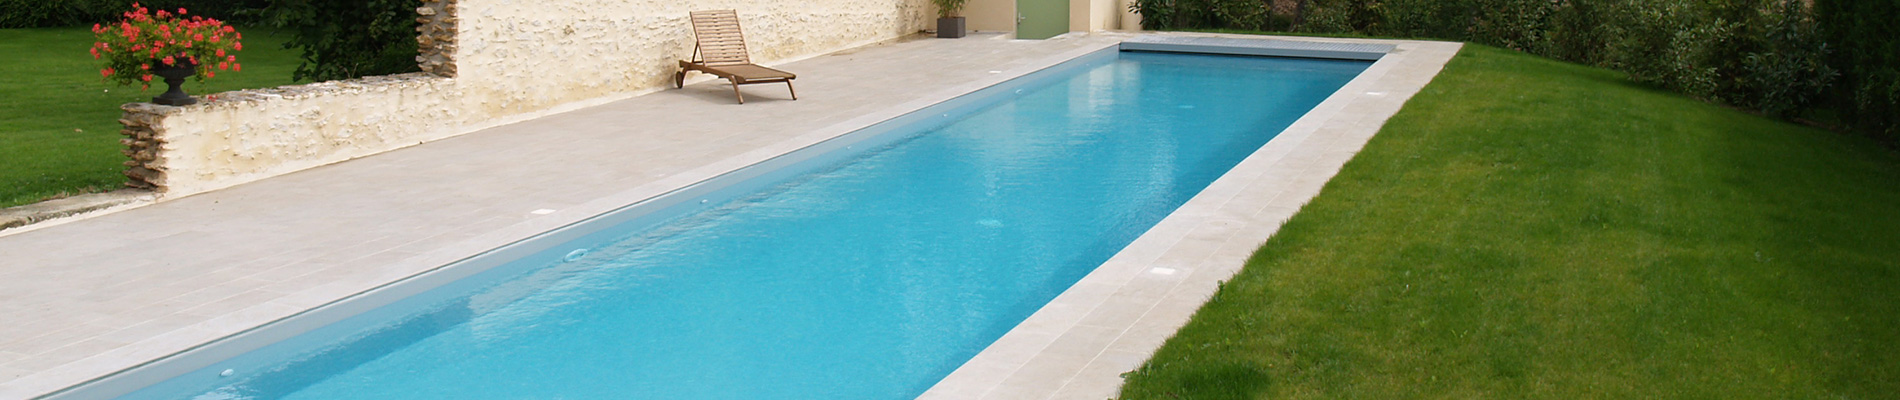 SPORTING, the swim corridor